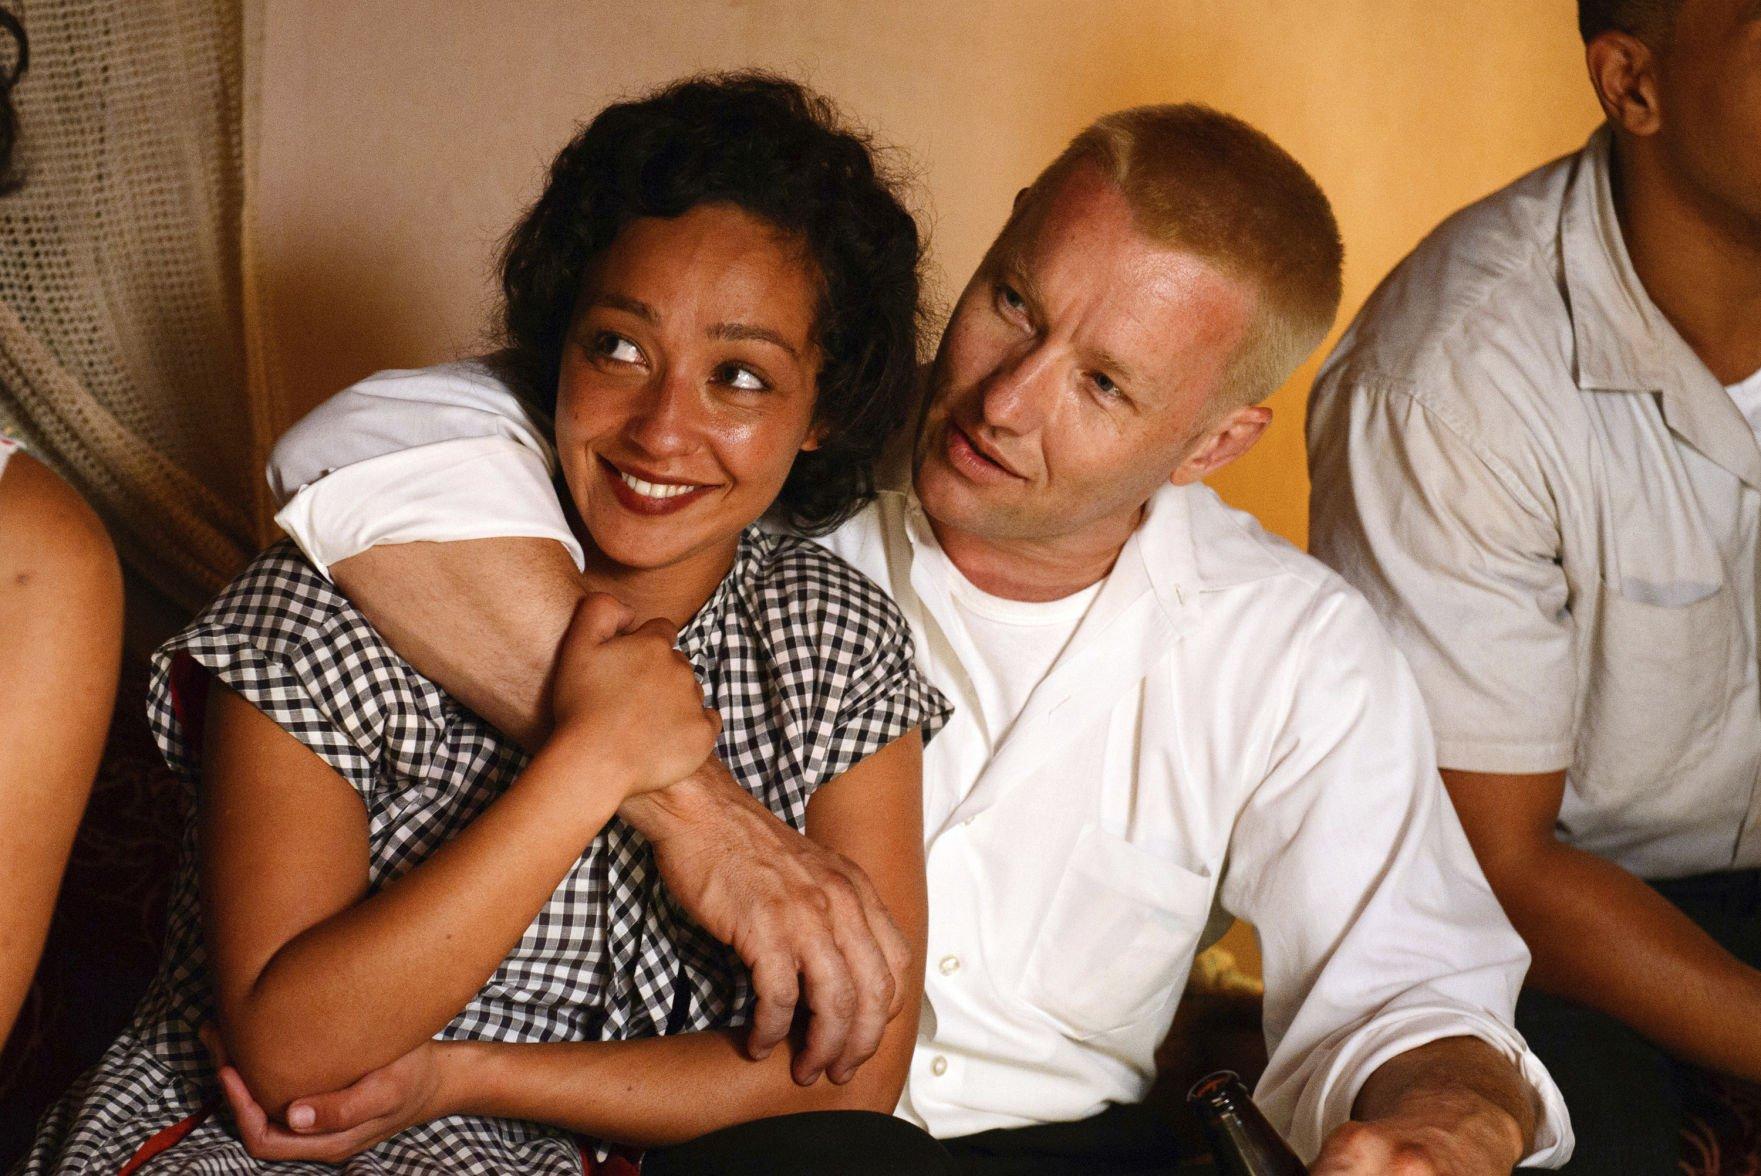 Interracial dating i Richmond VA Gratis Dating Sites Swindon